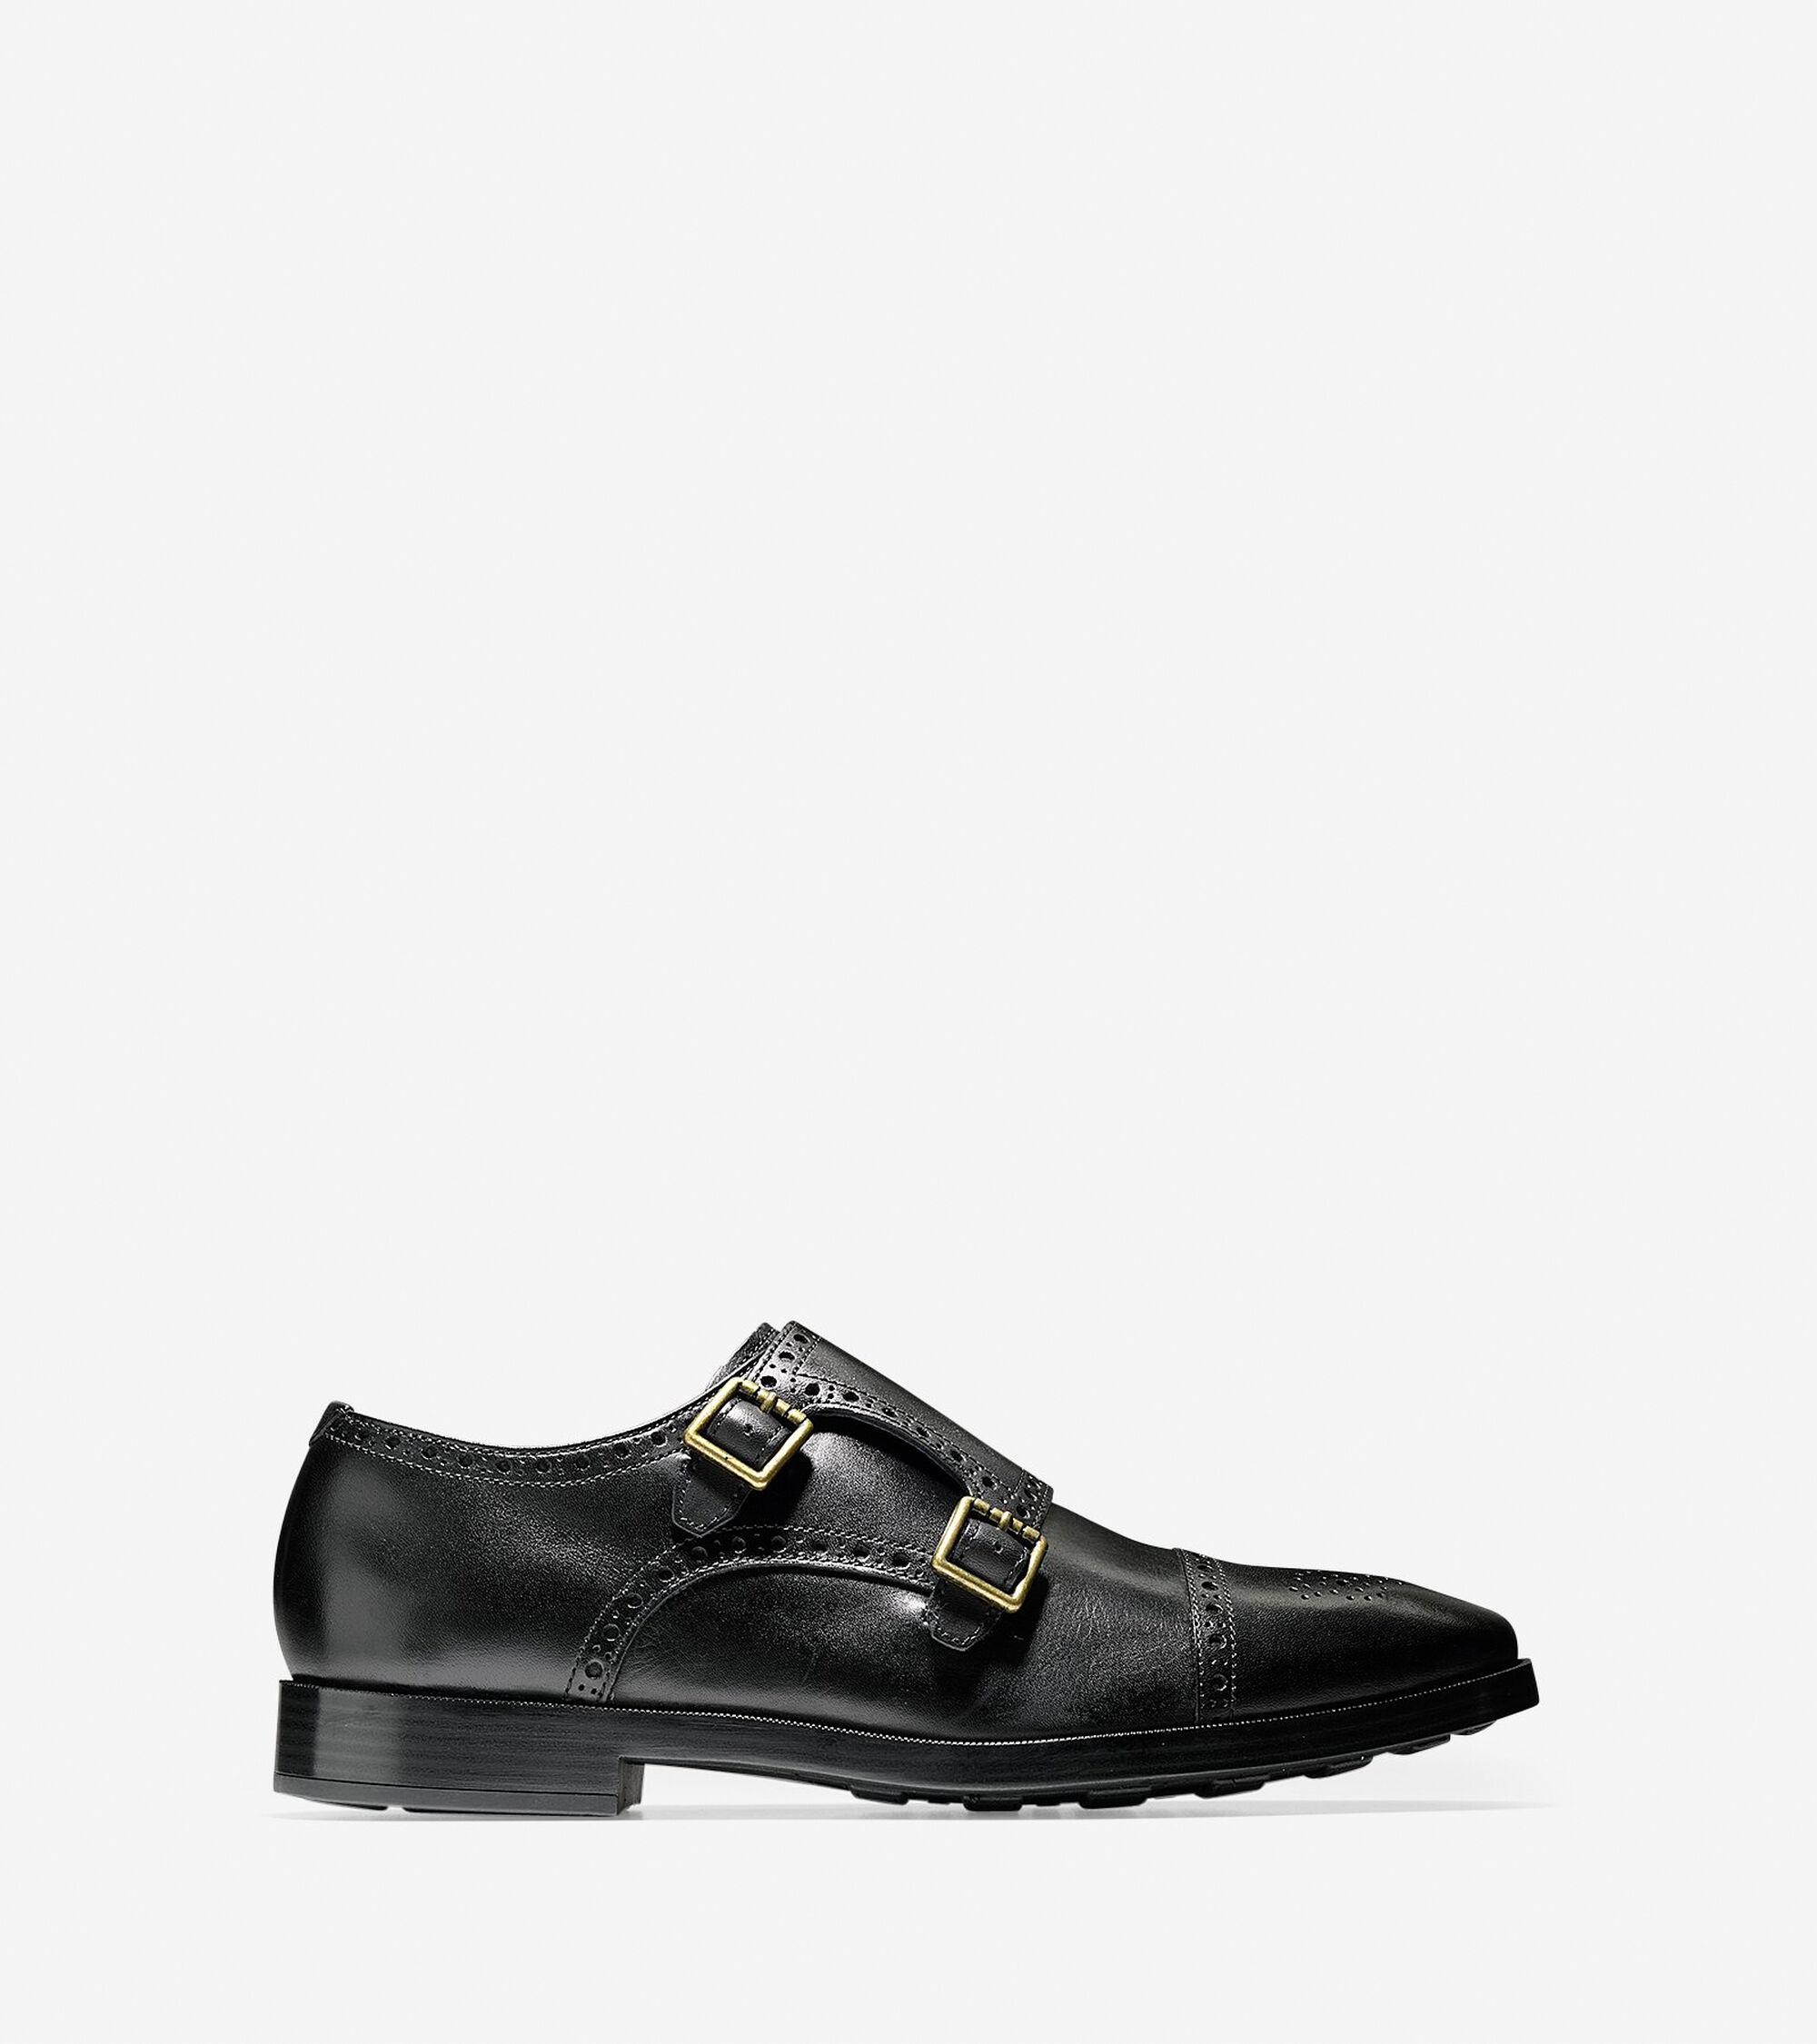 Cole Haan Jefferson Grand Double Monk Oxford Shoes